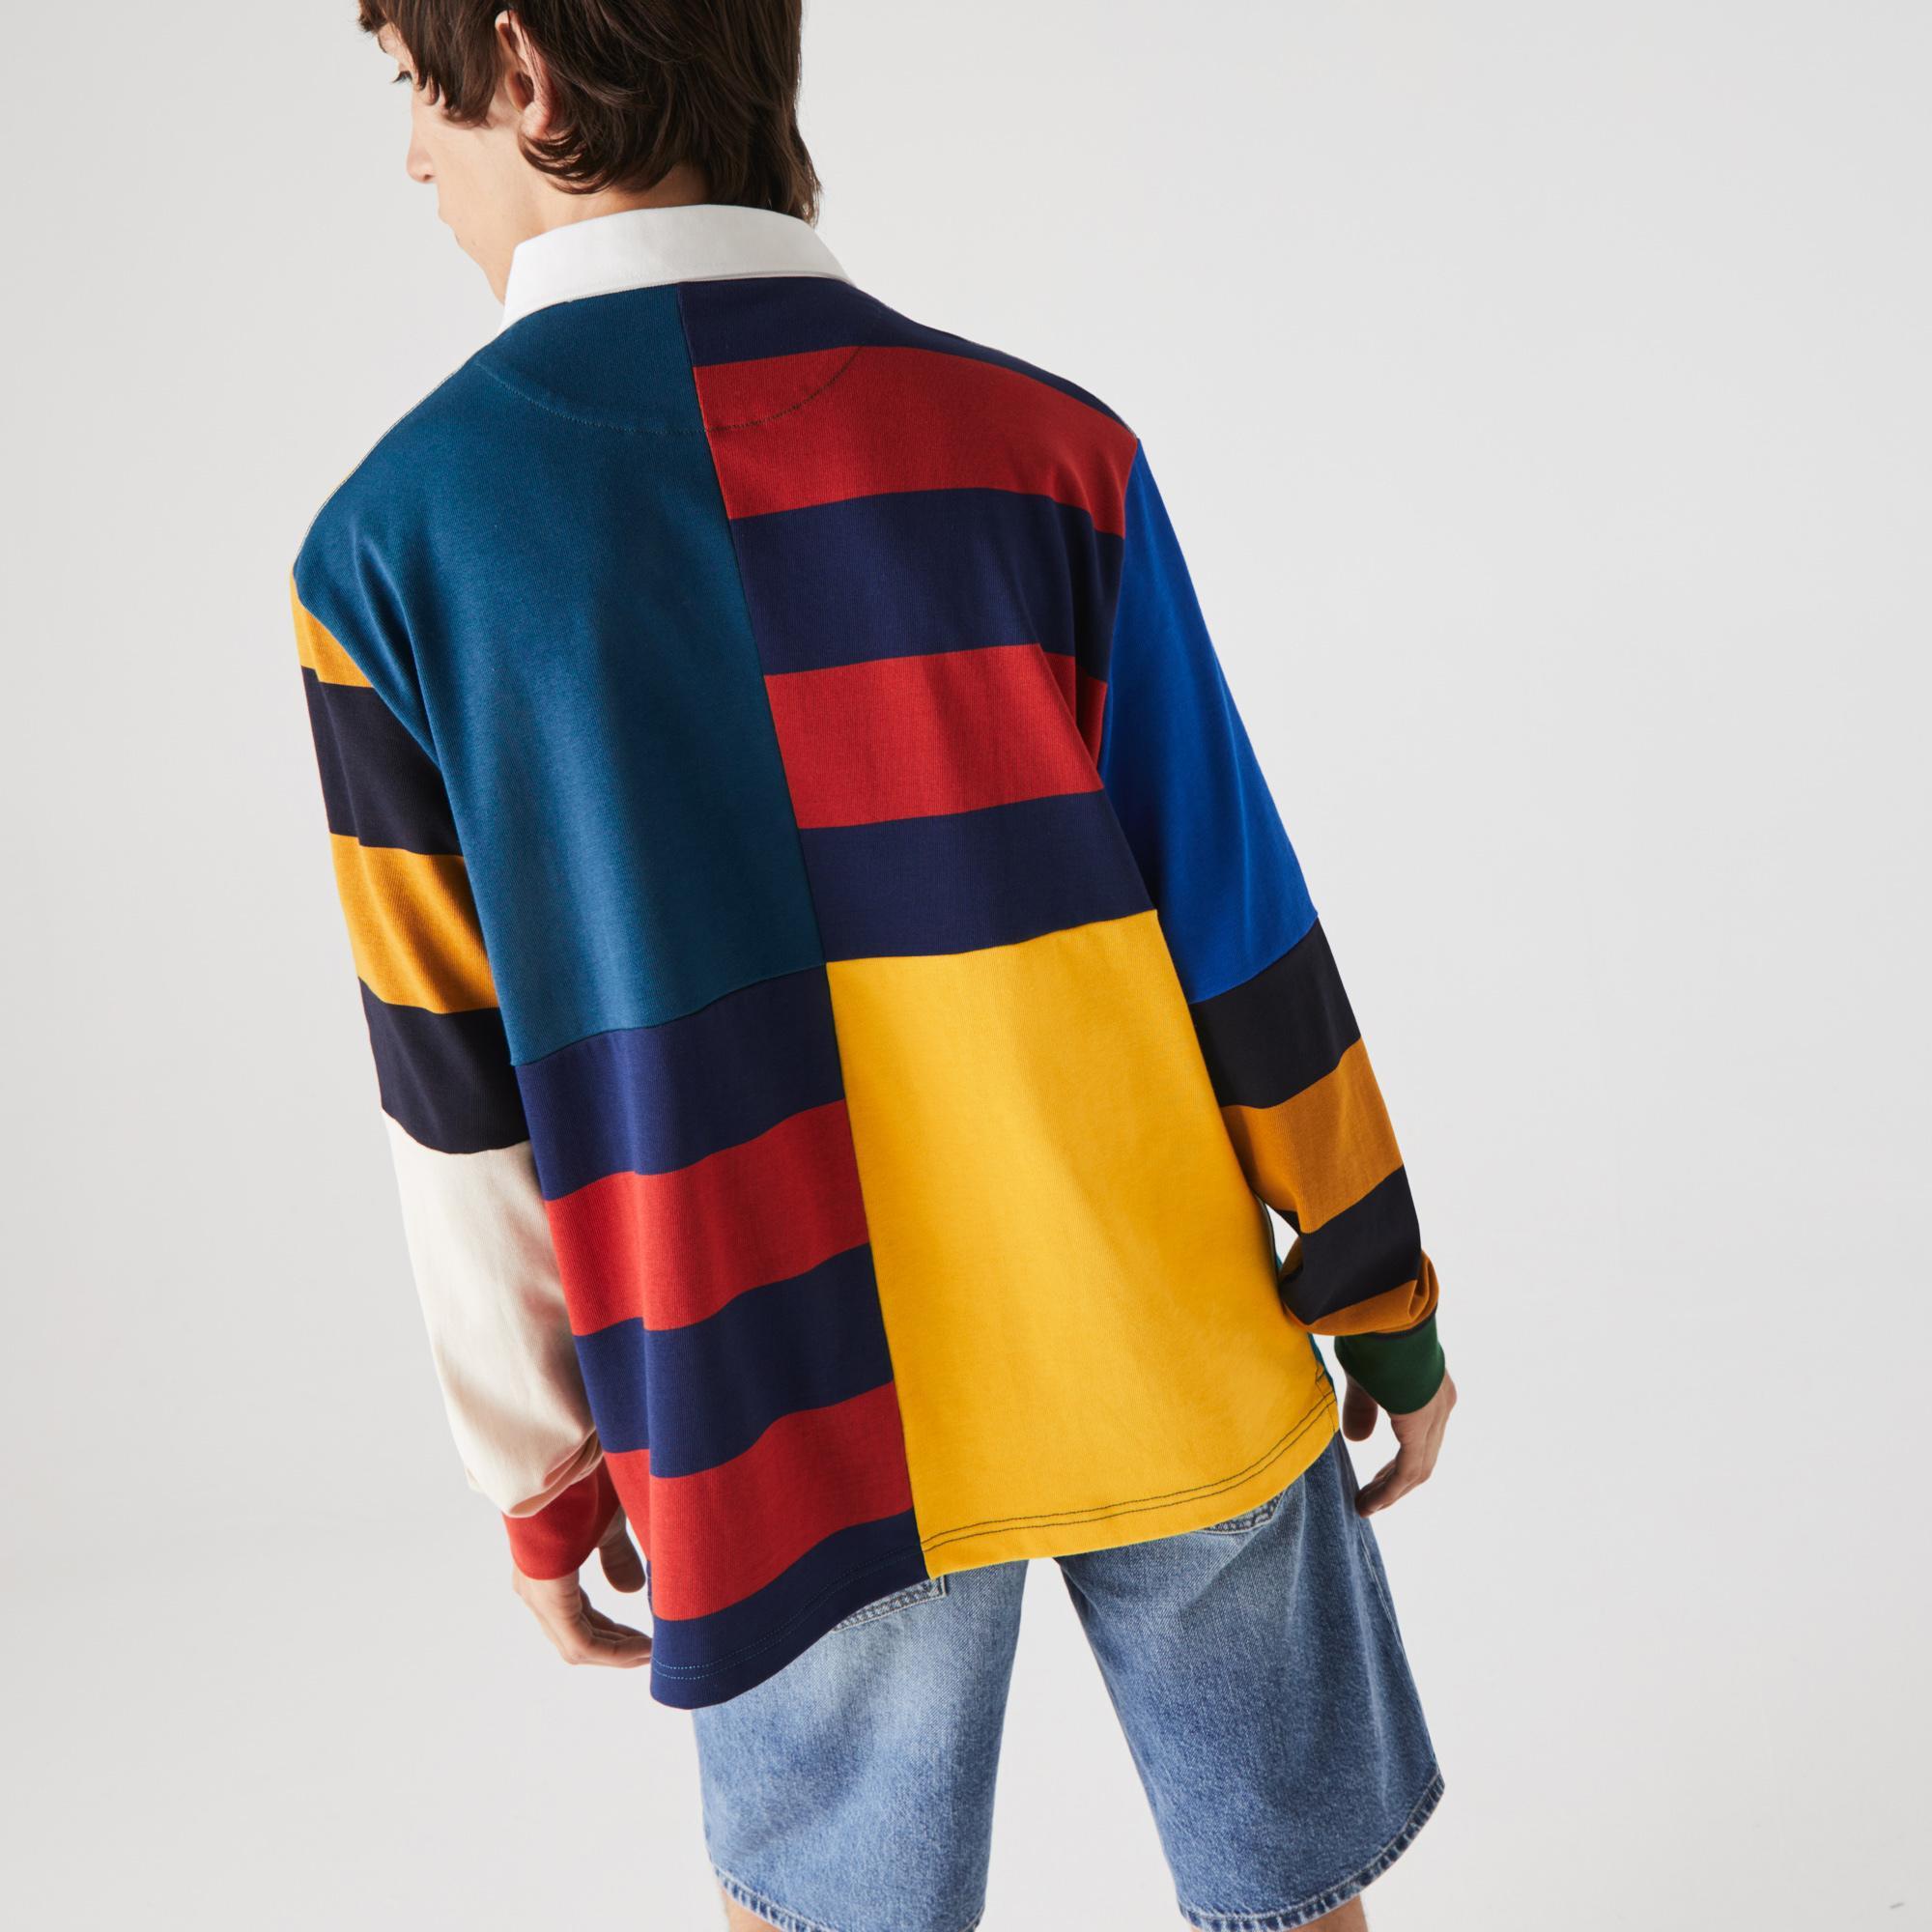 Lacoste L!ve Erkek Loose Fit Uzun Kollu Renk Bloklu Renkli Polo